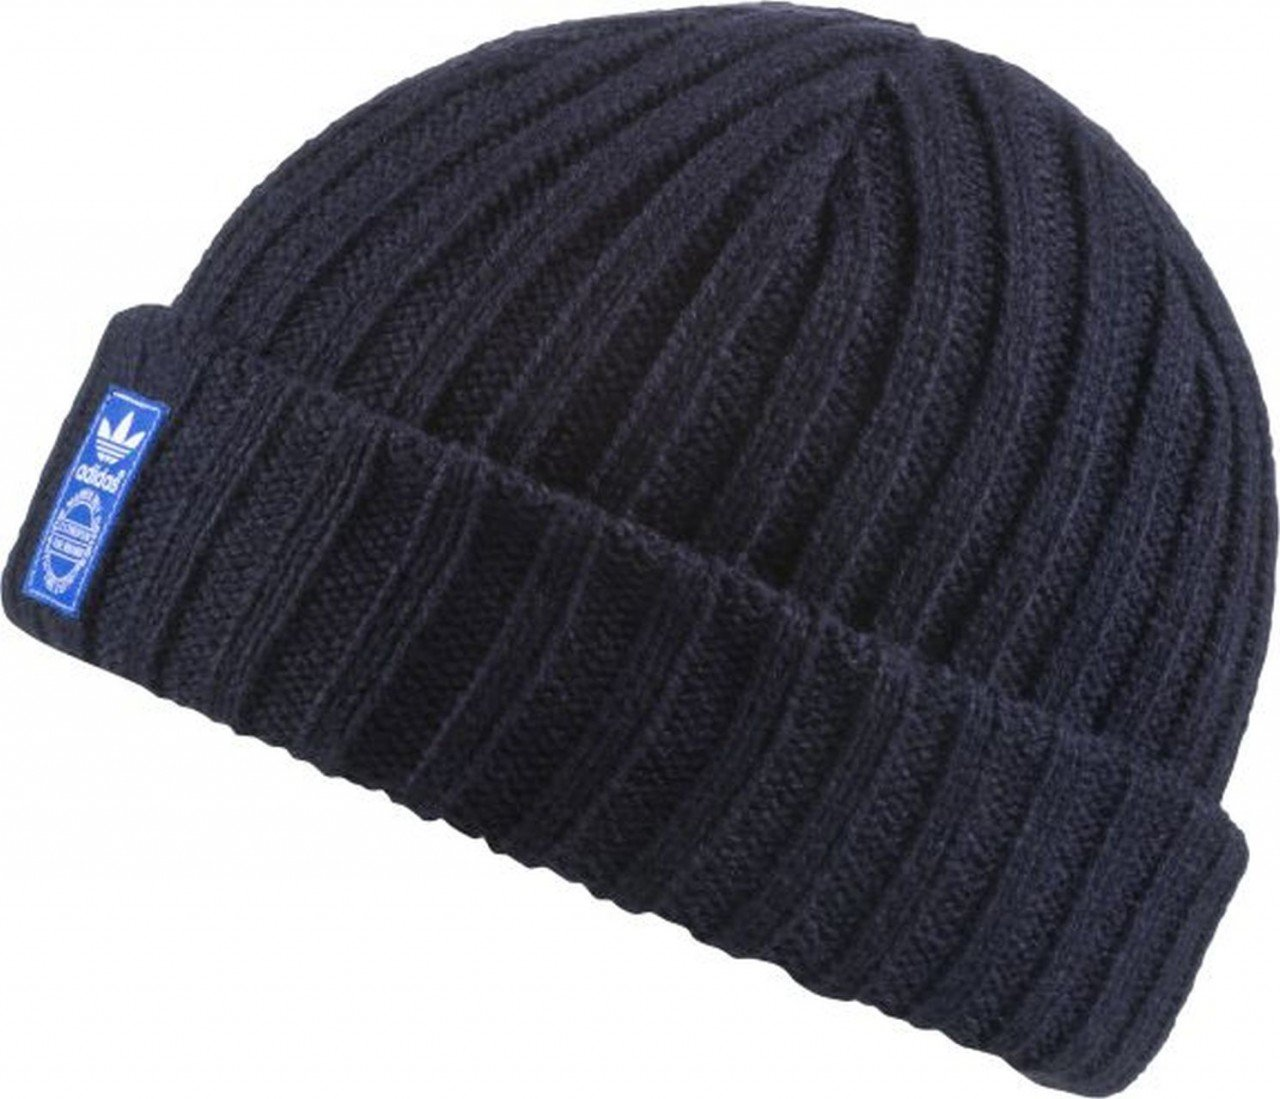 Adidas Berretto stile pescatore, Unisex, Mütze Fisherman-Style, Collegiate Navy/Bluebird/White